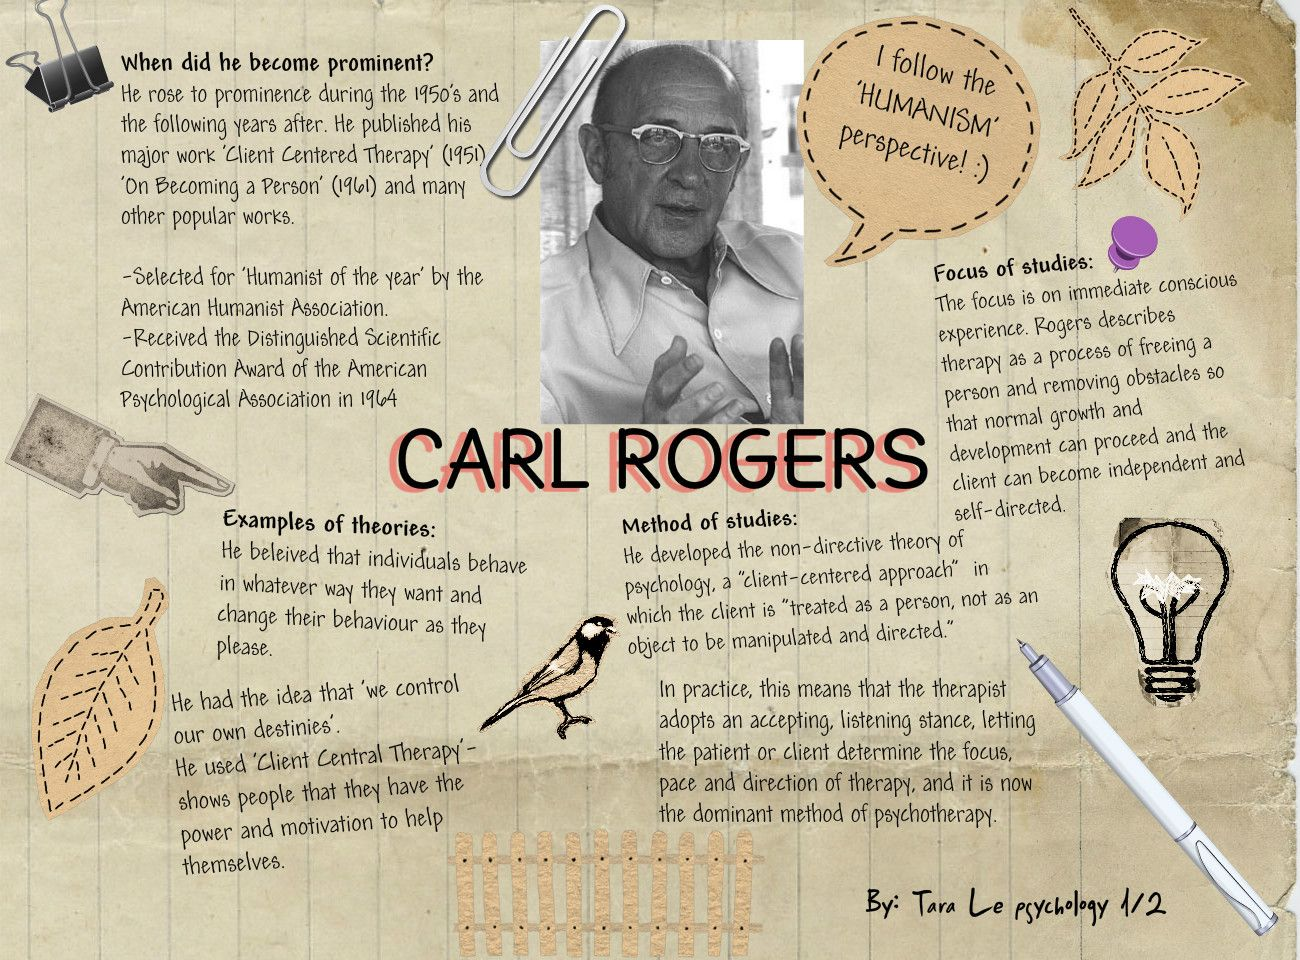 Carl Rogers Posterised By The Insightful Tara Le